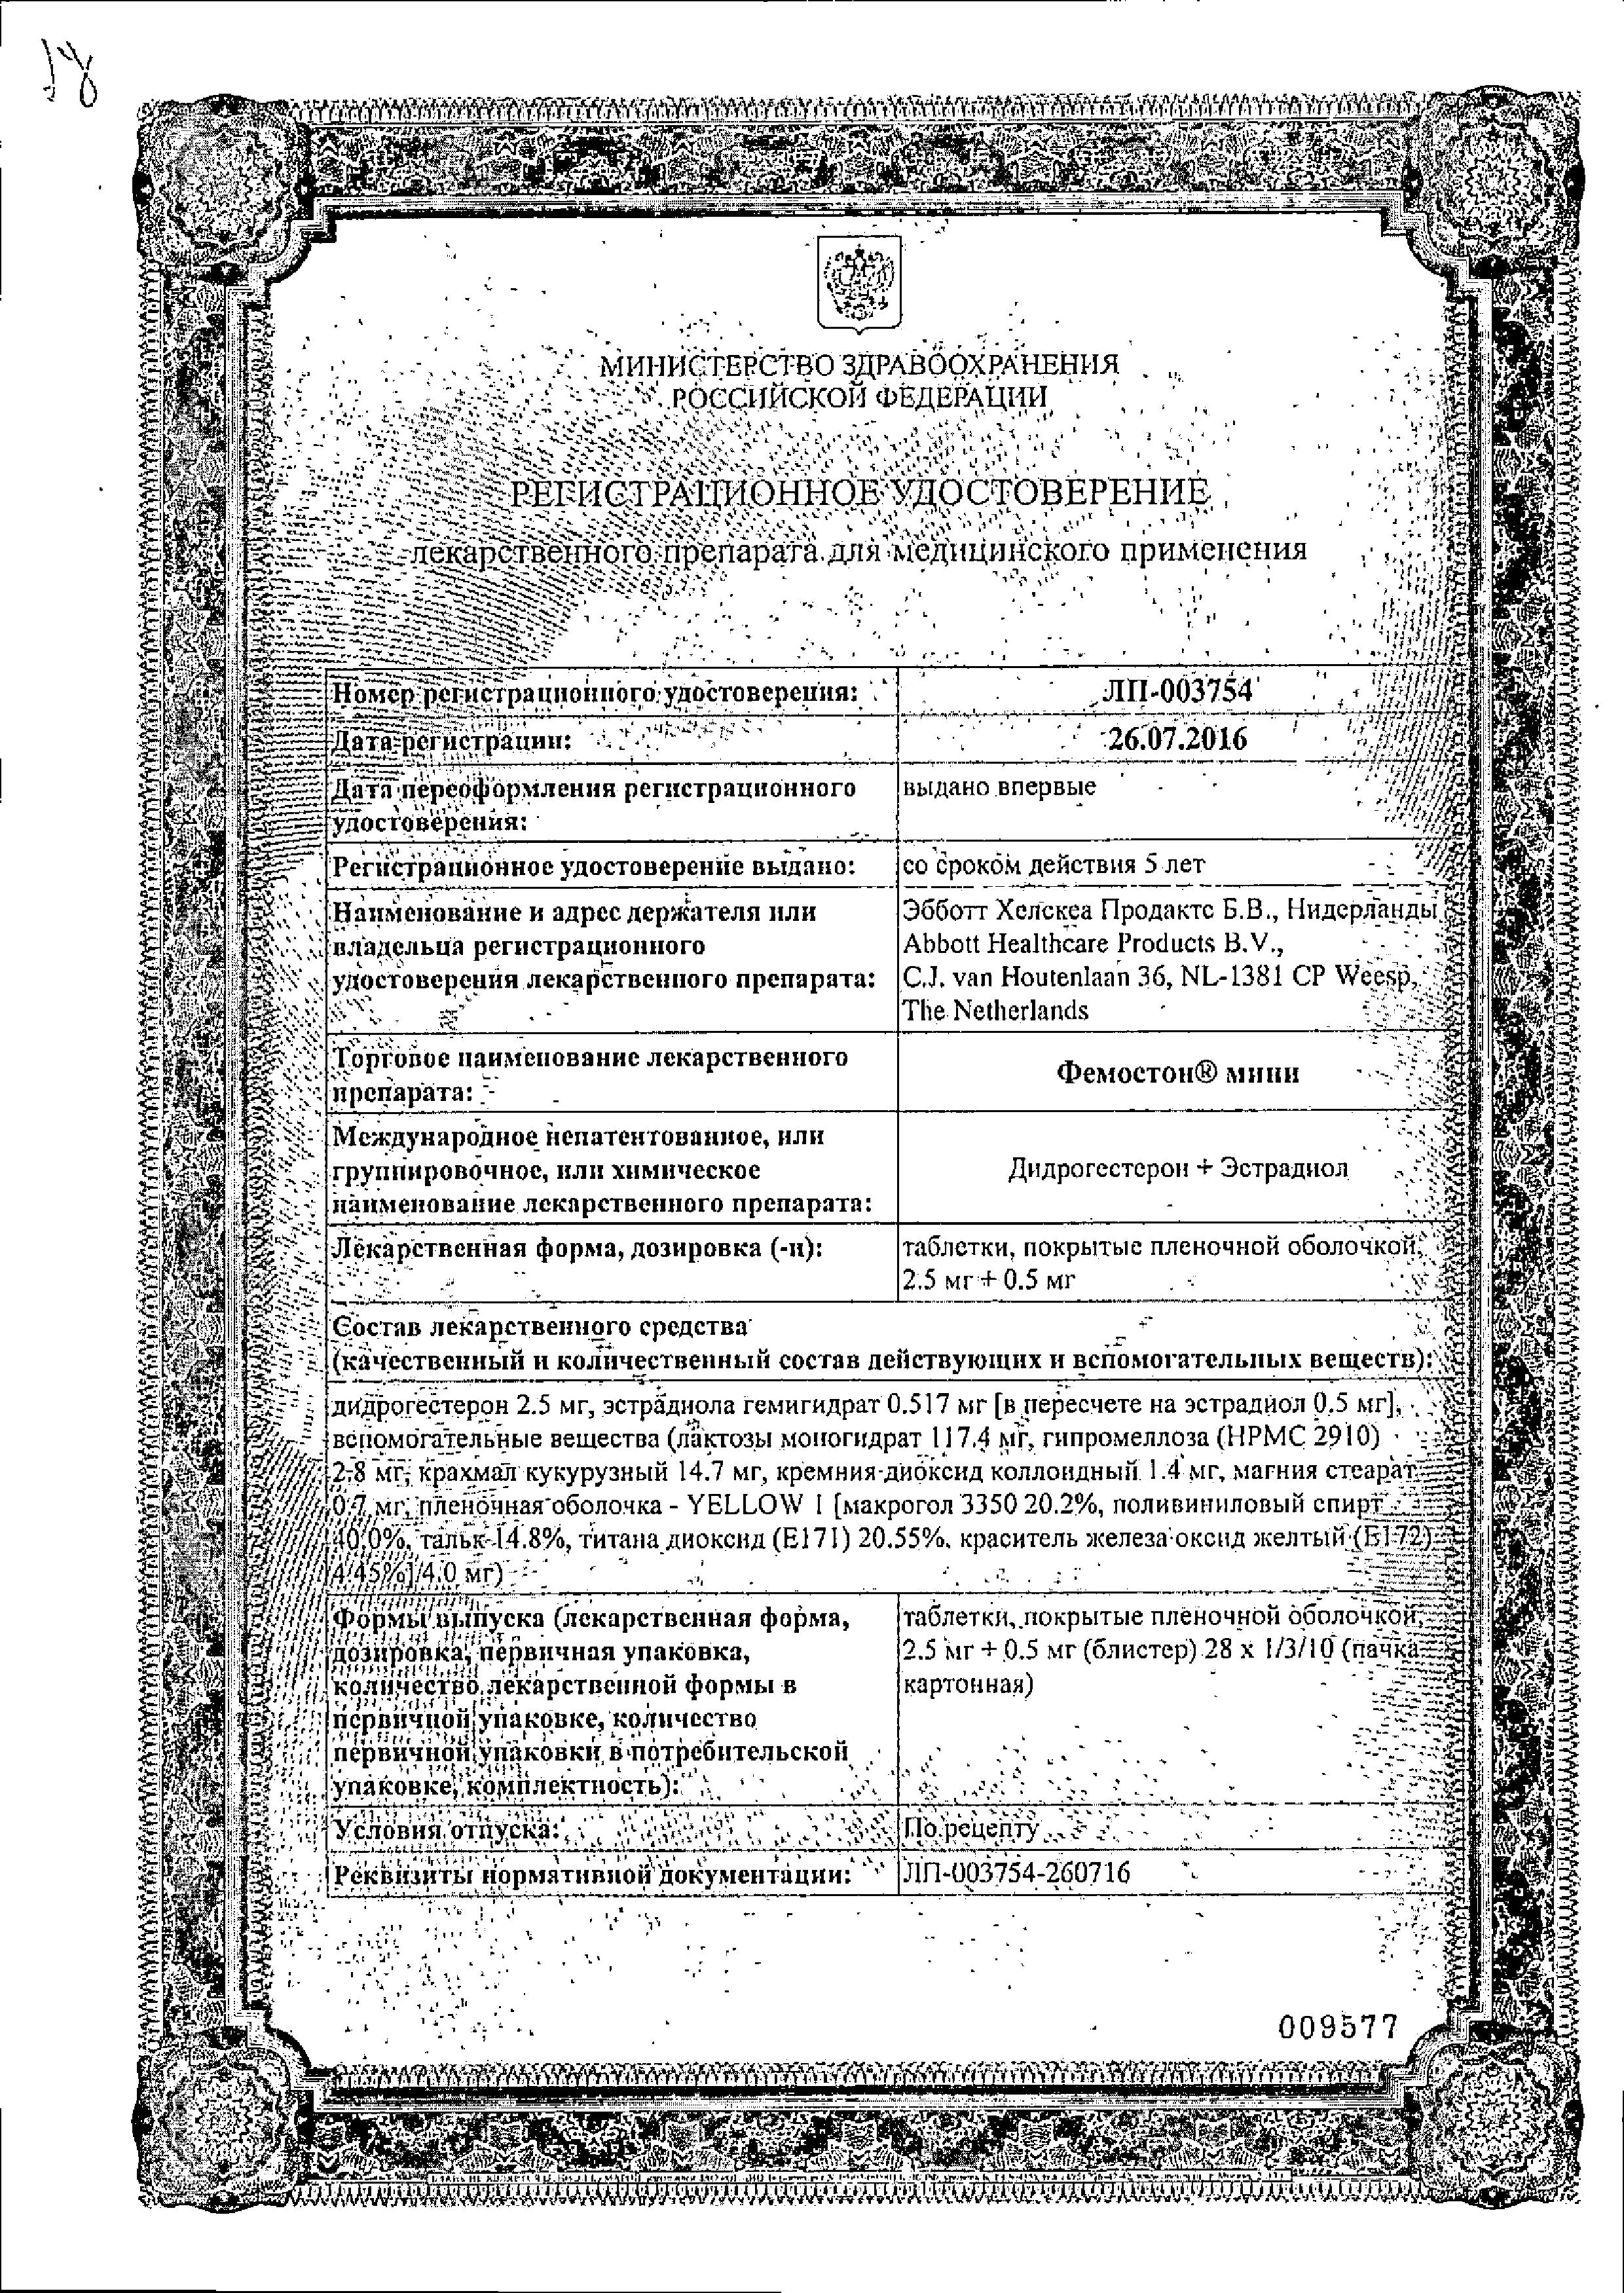 Фемостон мини сертификат